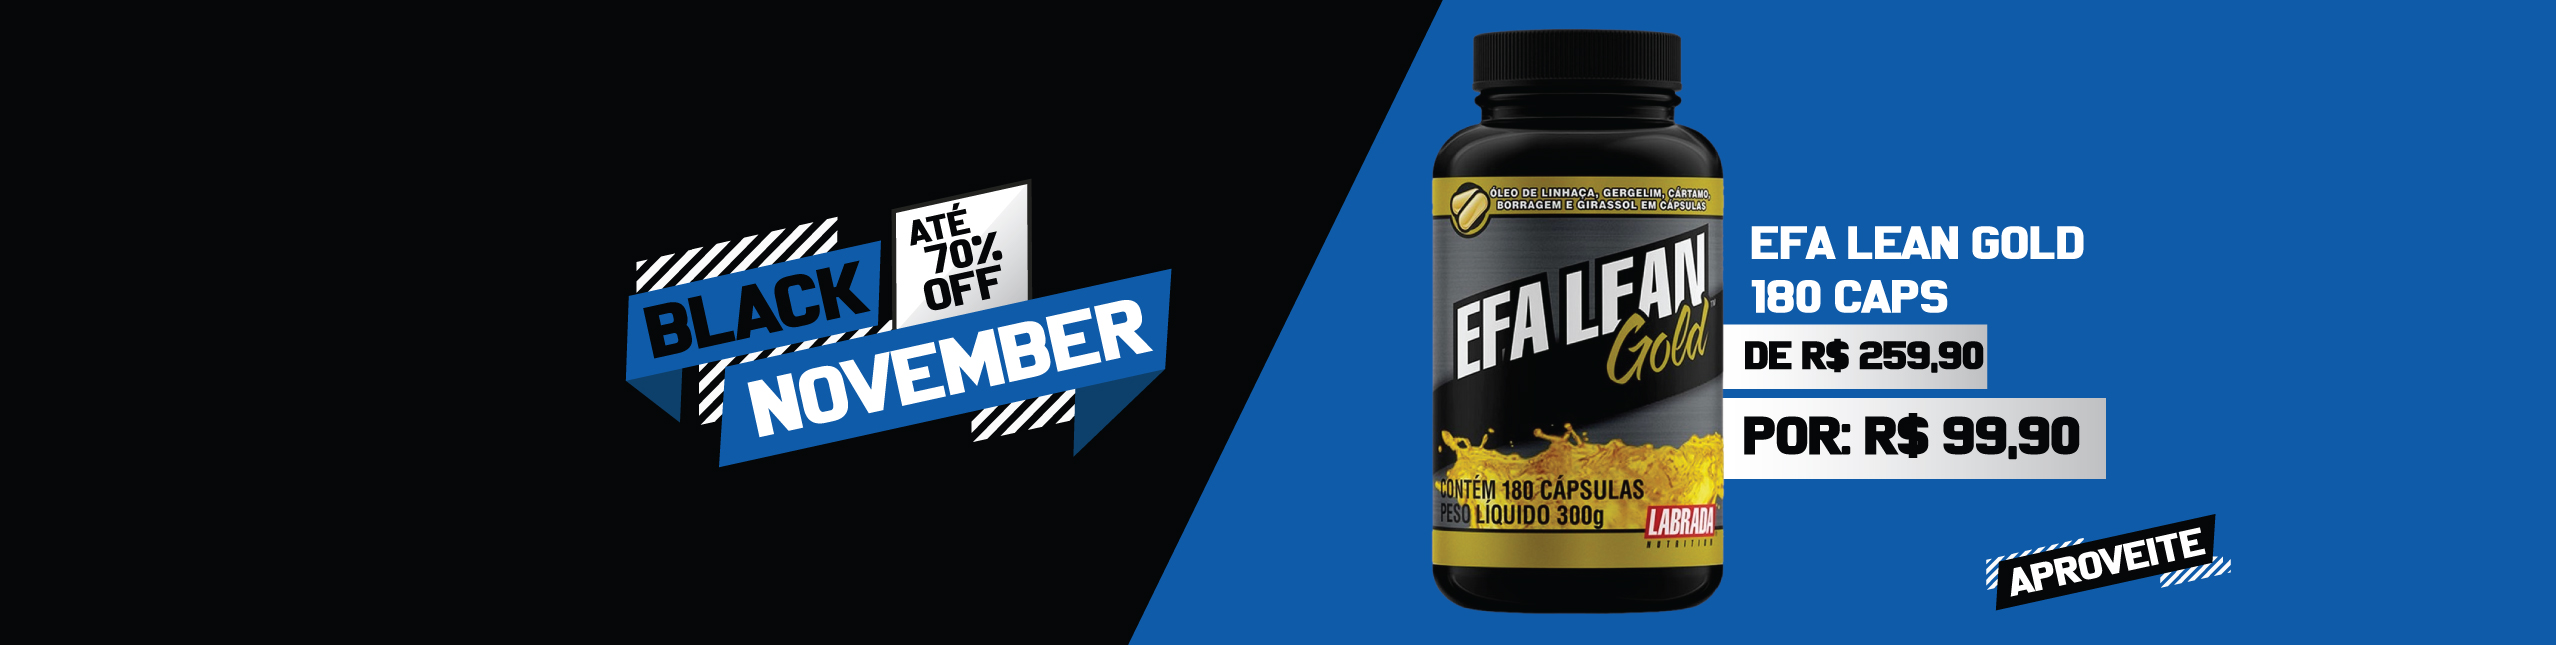 EFA Lean Gold - R$259,90 por R$99,90